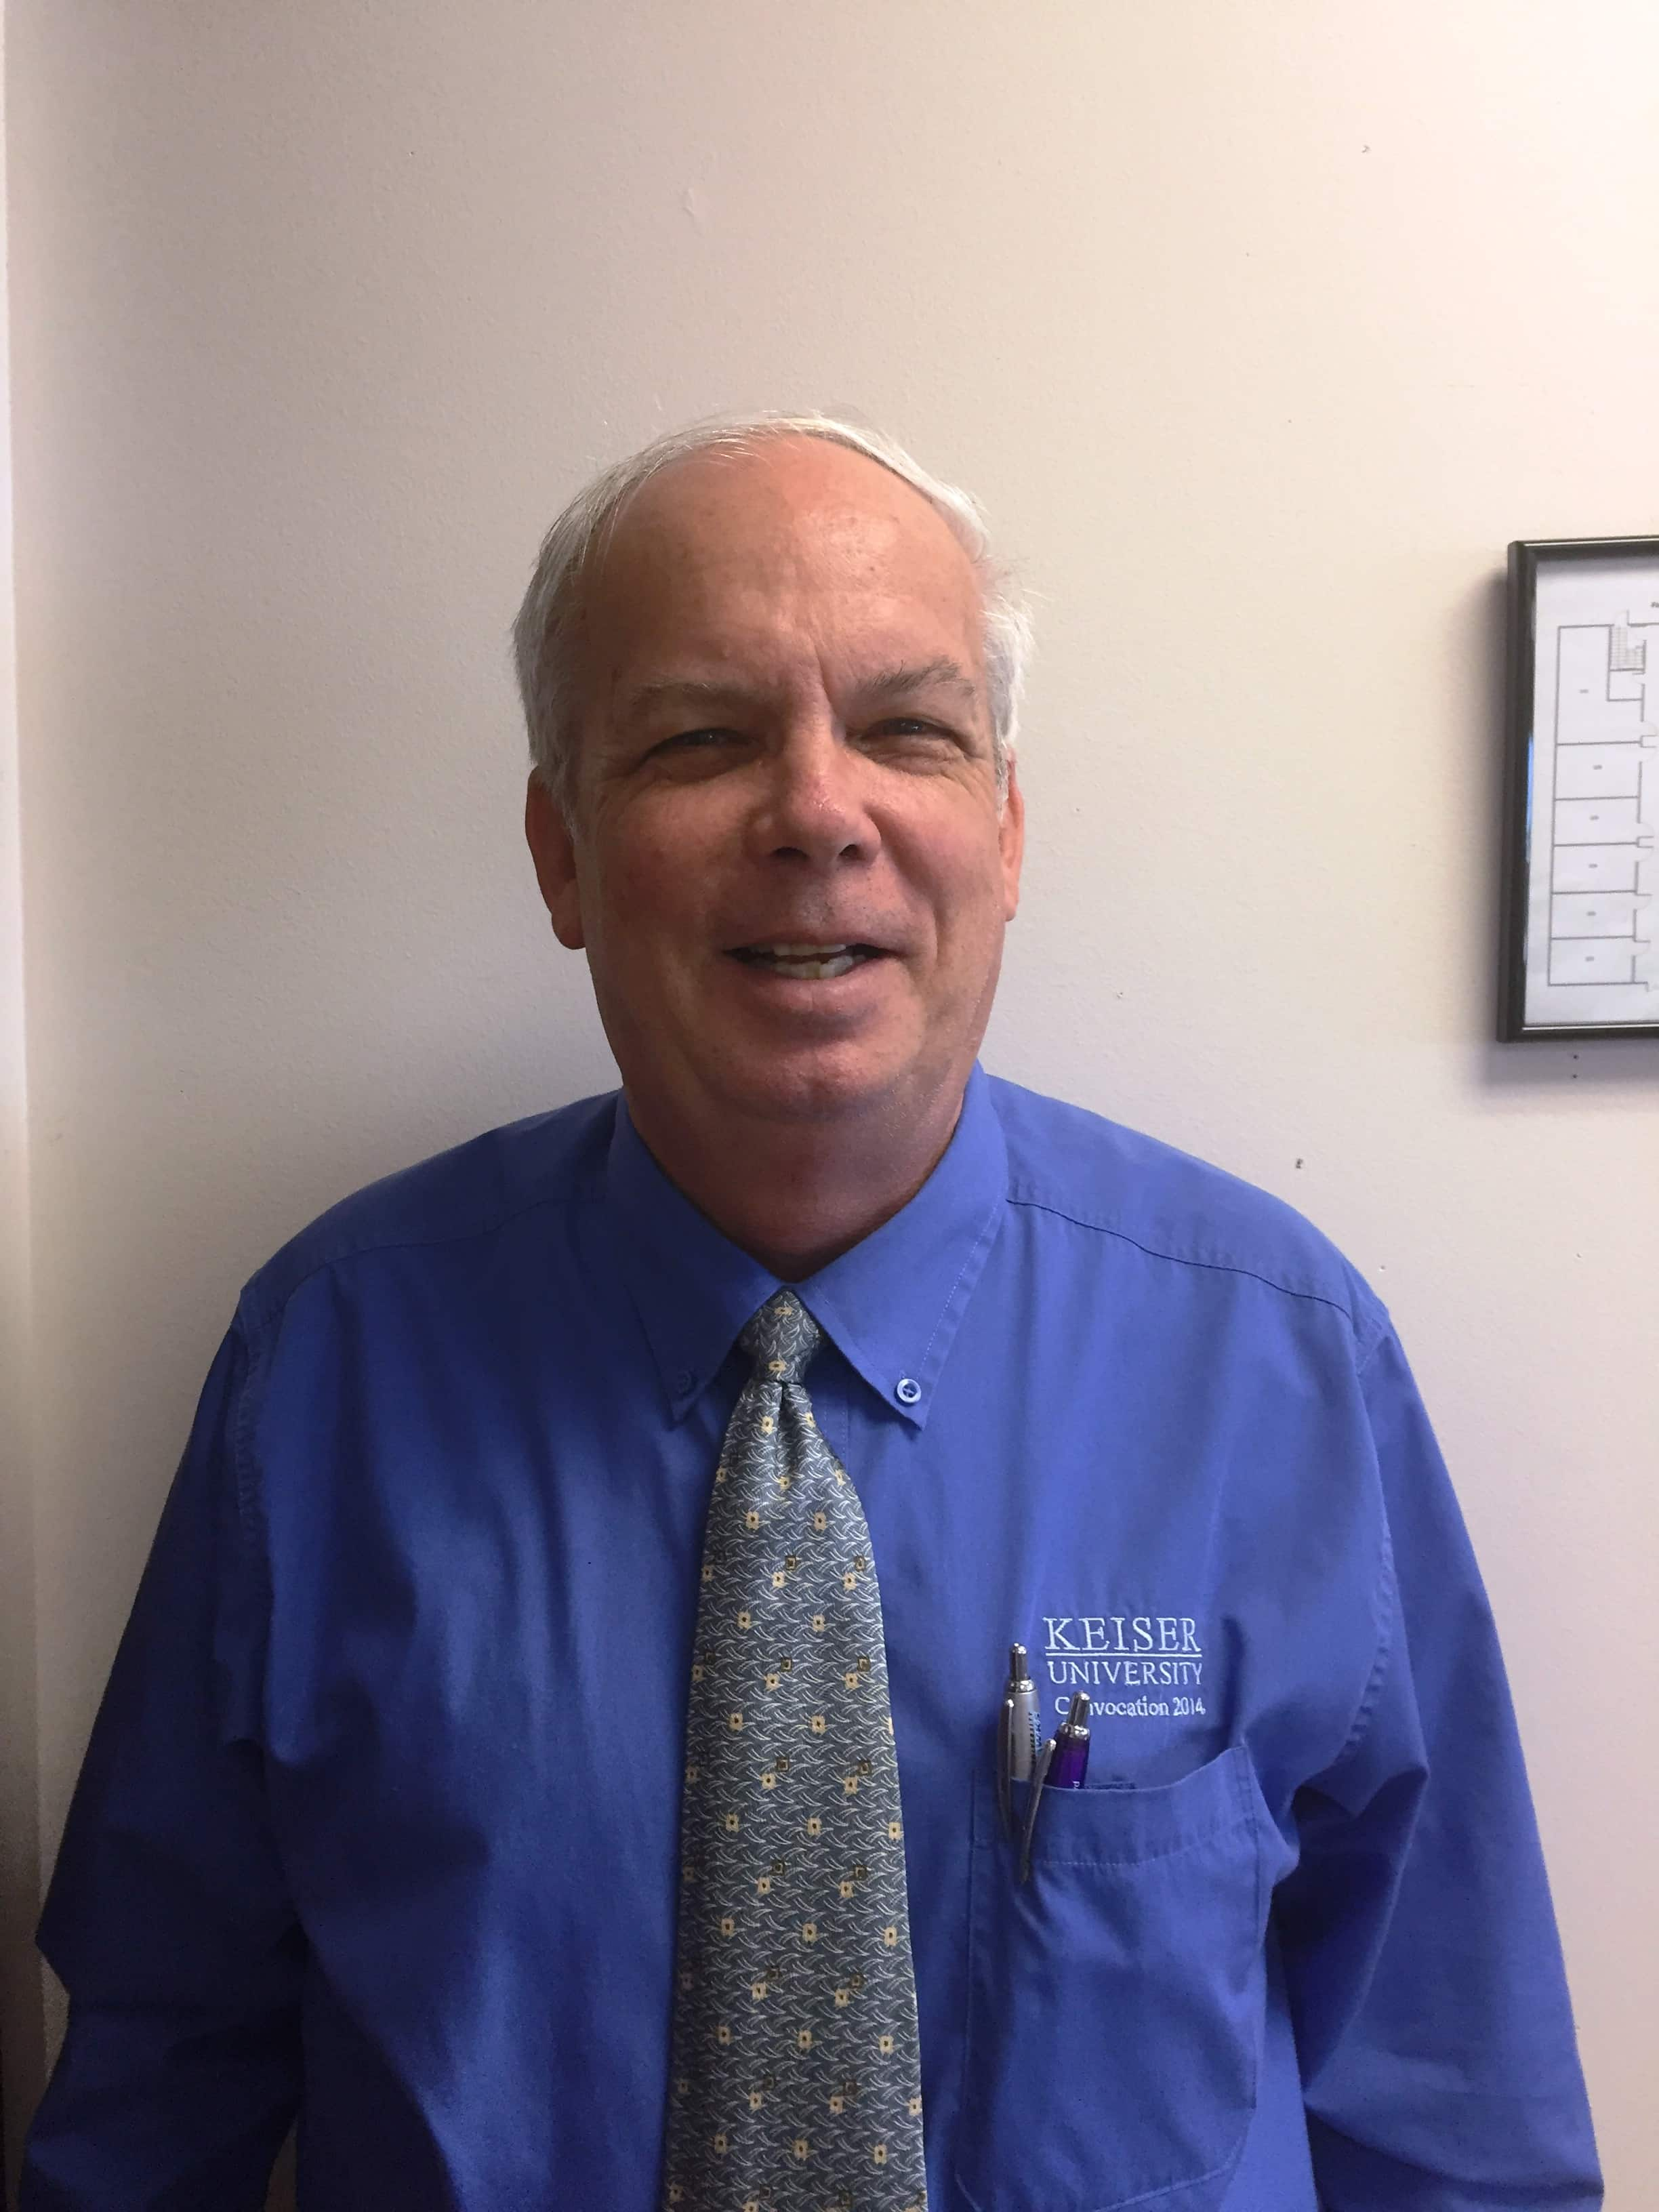 Keiser University Pa Program >> FACULTY SPOTLIGHT: Michael Bishop, Program Director for